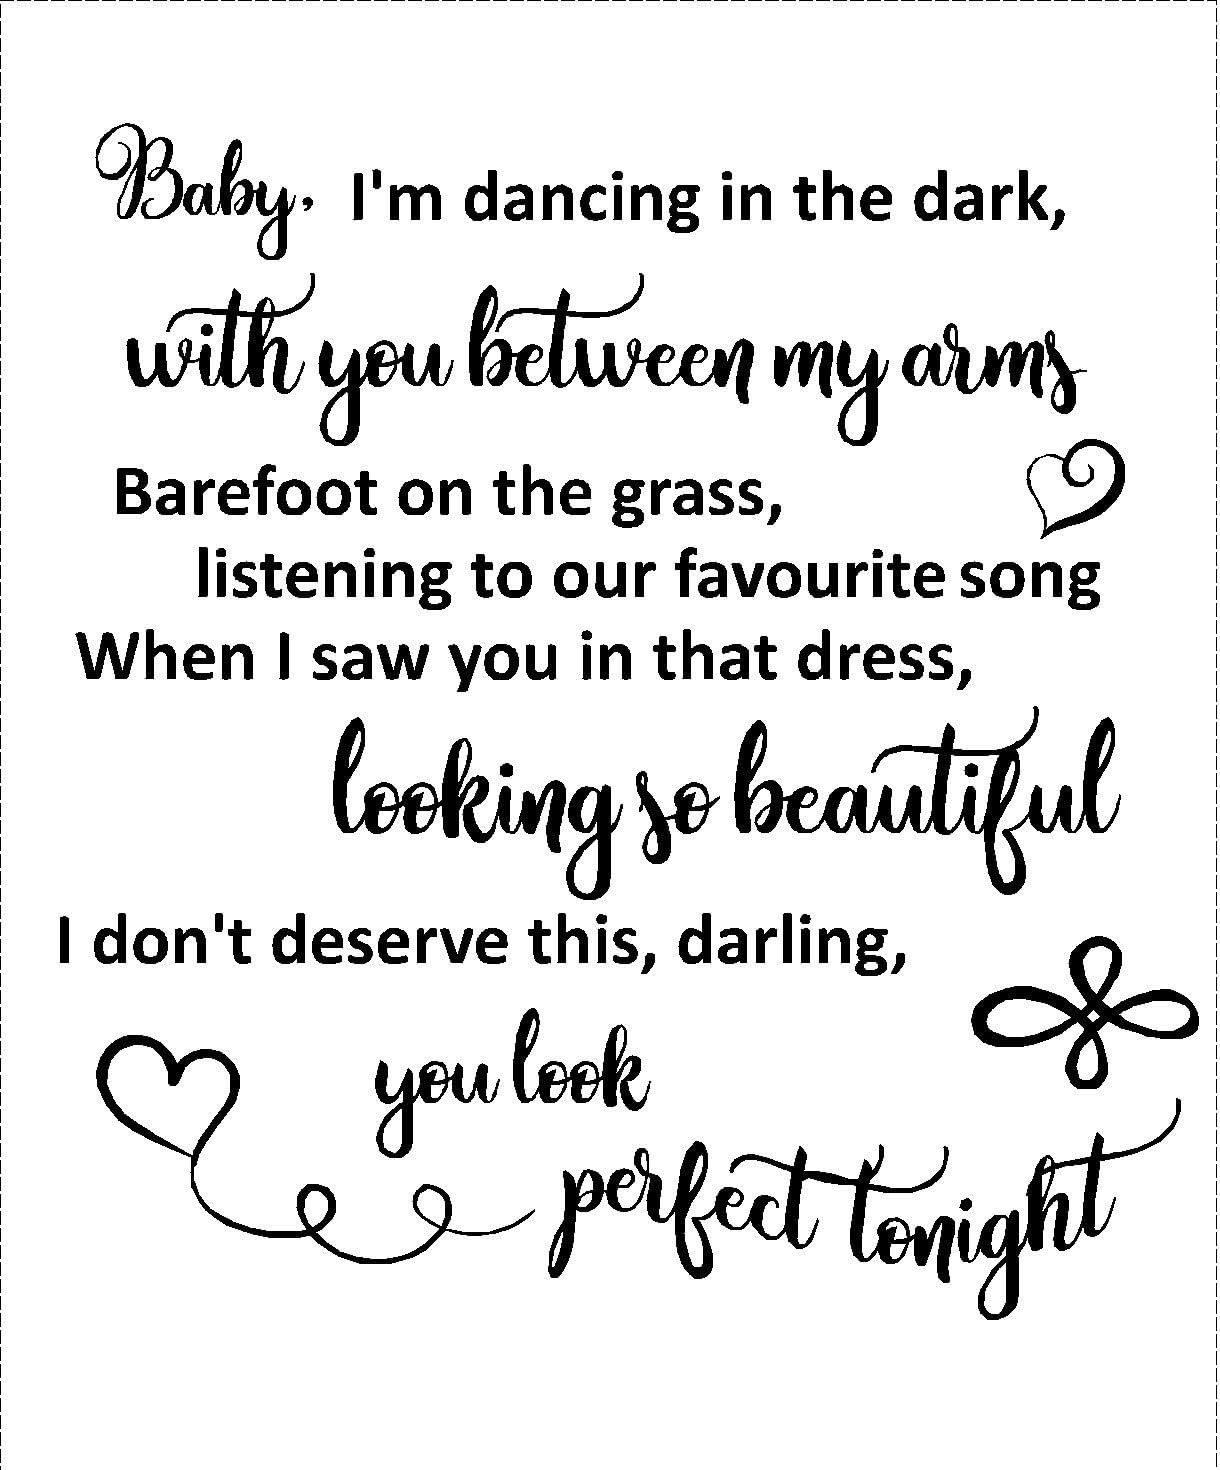 Lightningsigns Perfect Ed Sheeran Love Songtext Für Hochzeit Wanddekoration Mattes Schwarz Amazon De Baumarkt